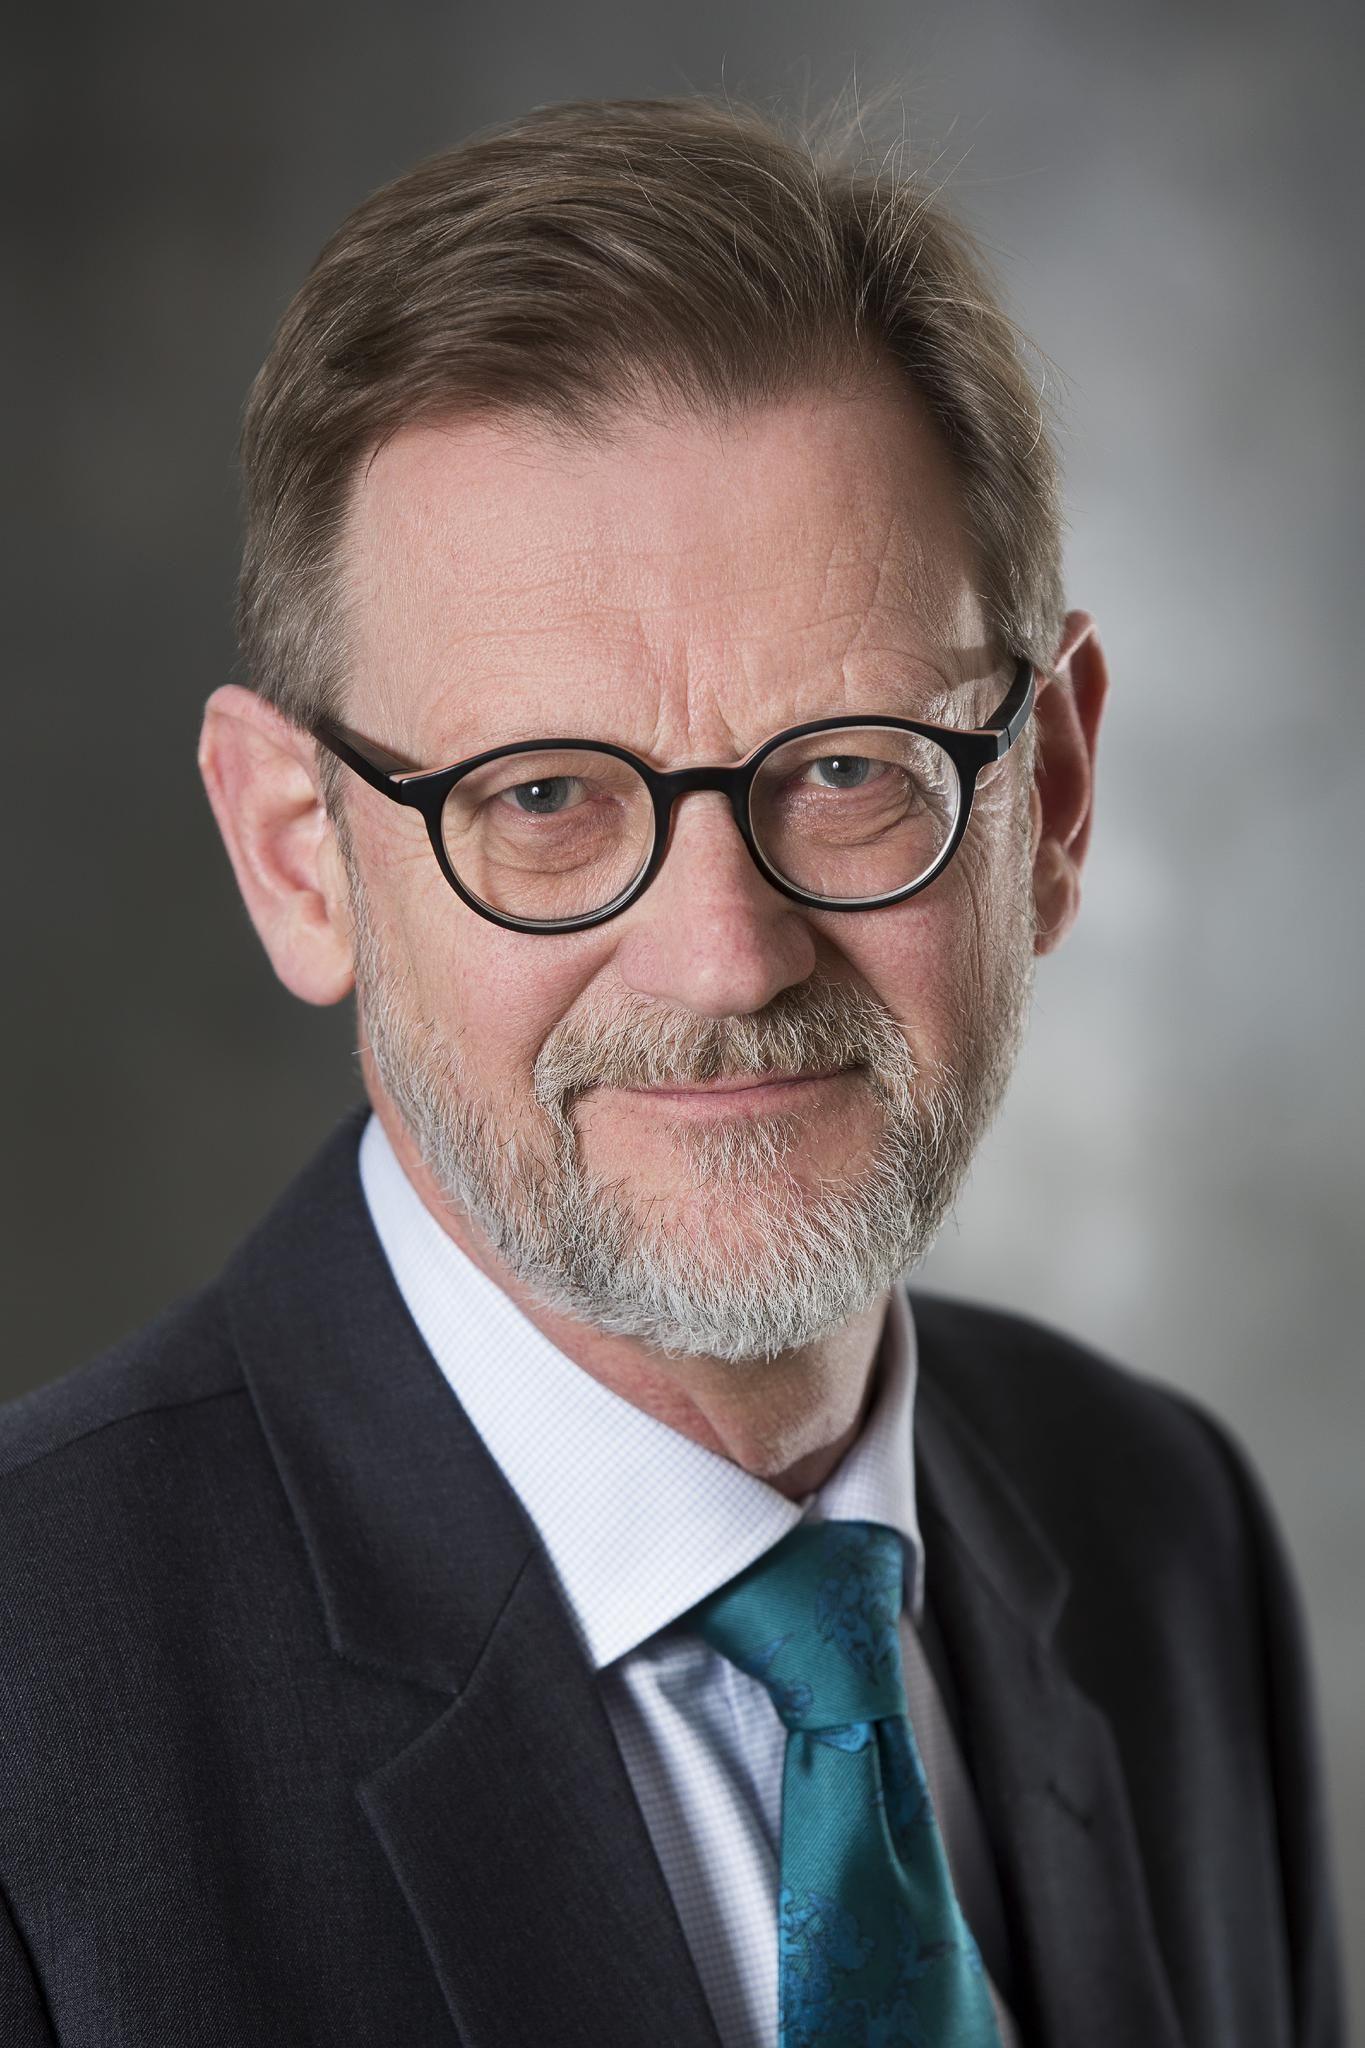 Nils Svartz